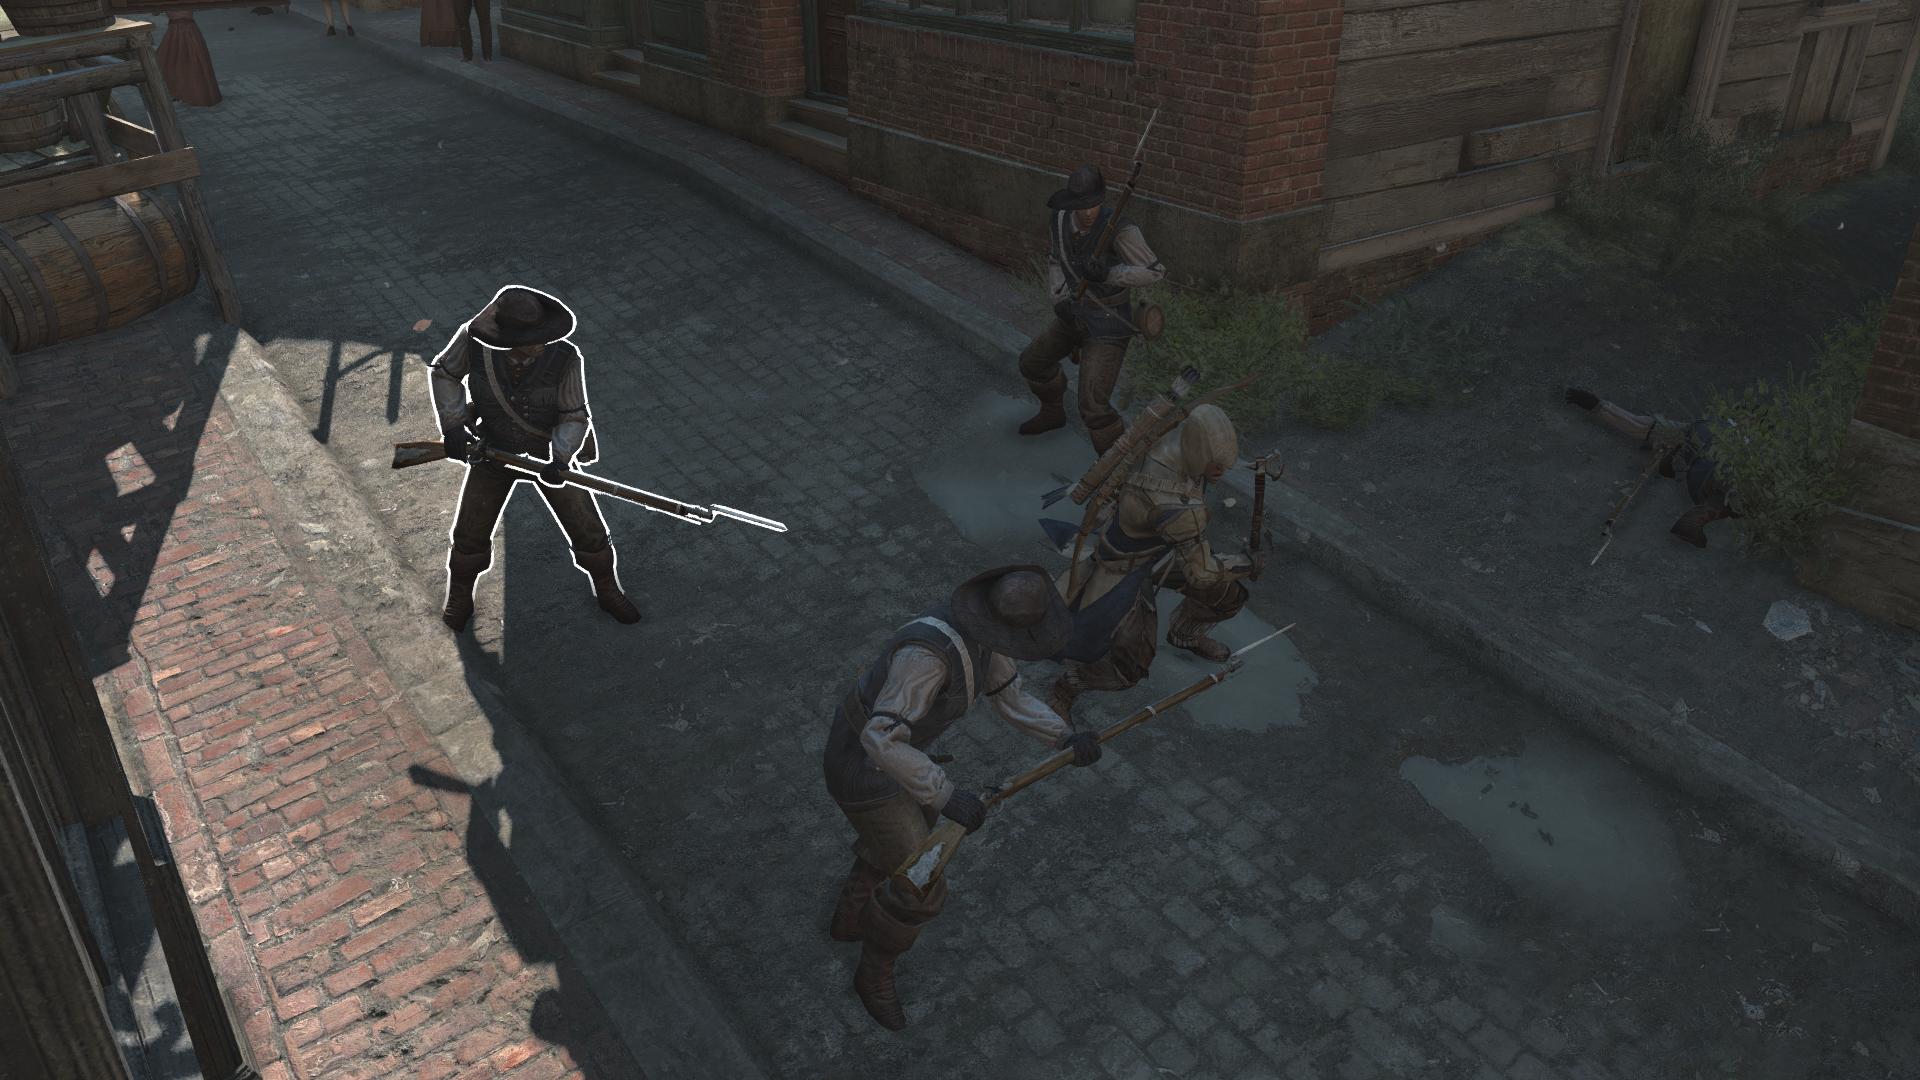 Tomahawk Assassin S Creed Wiki Fandom